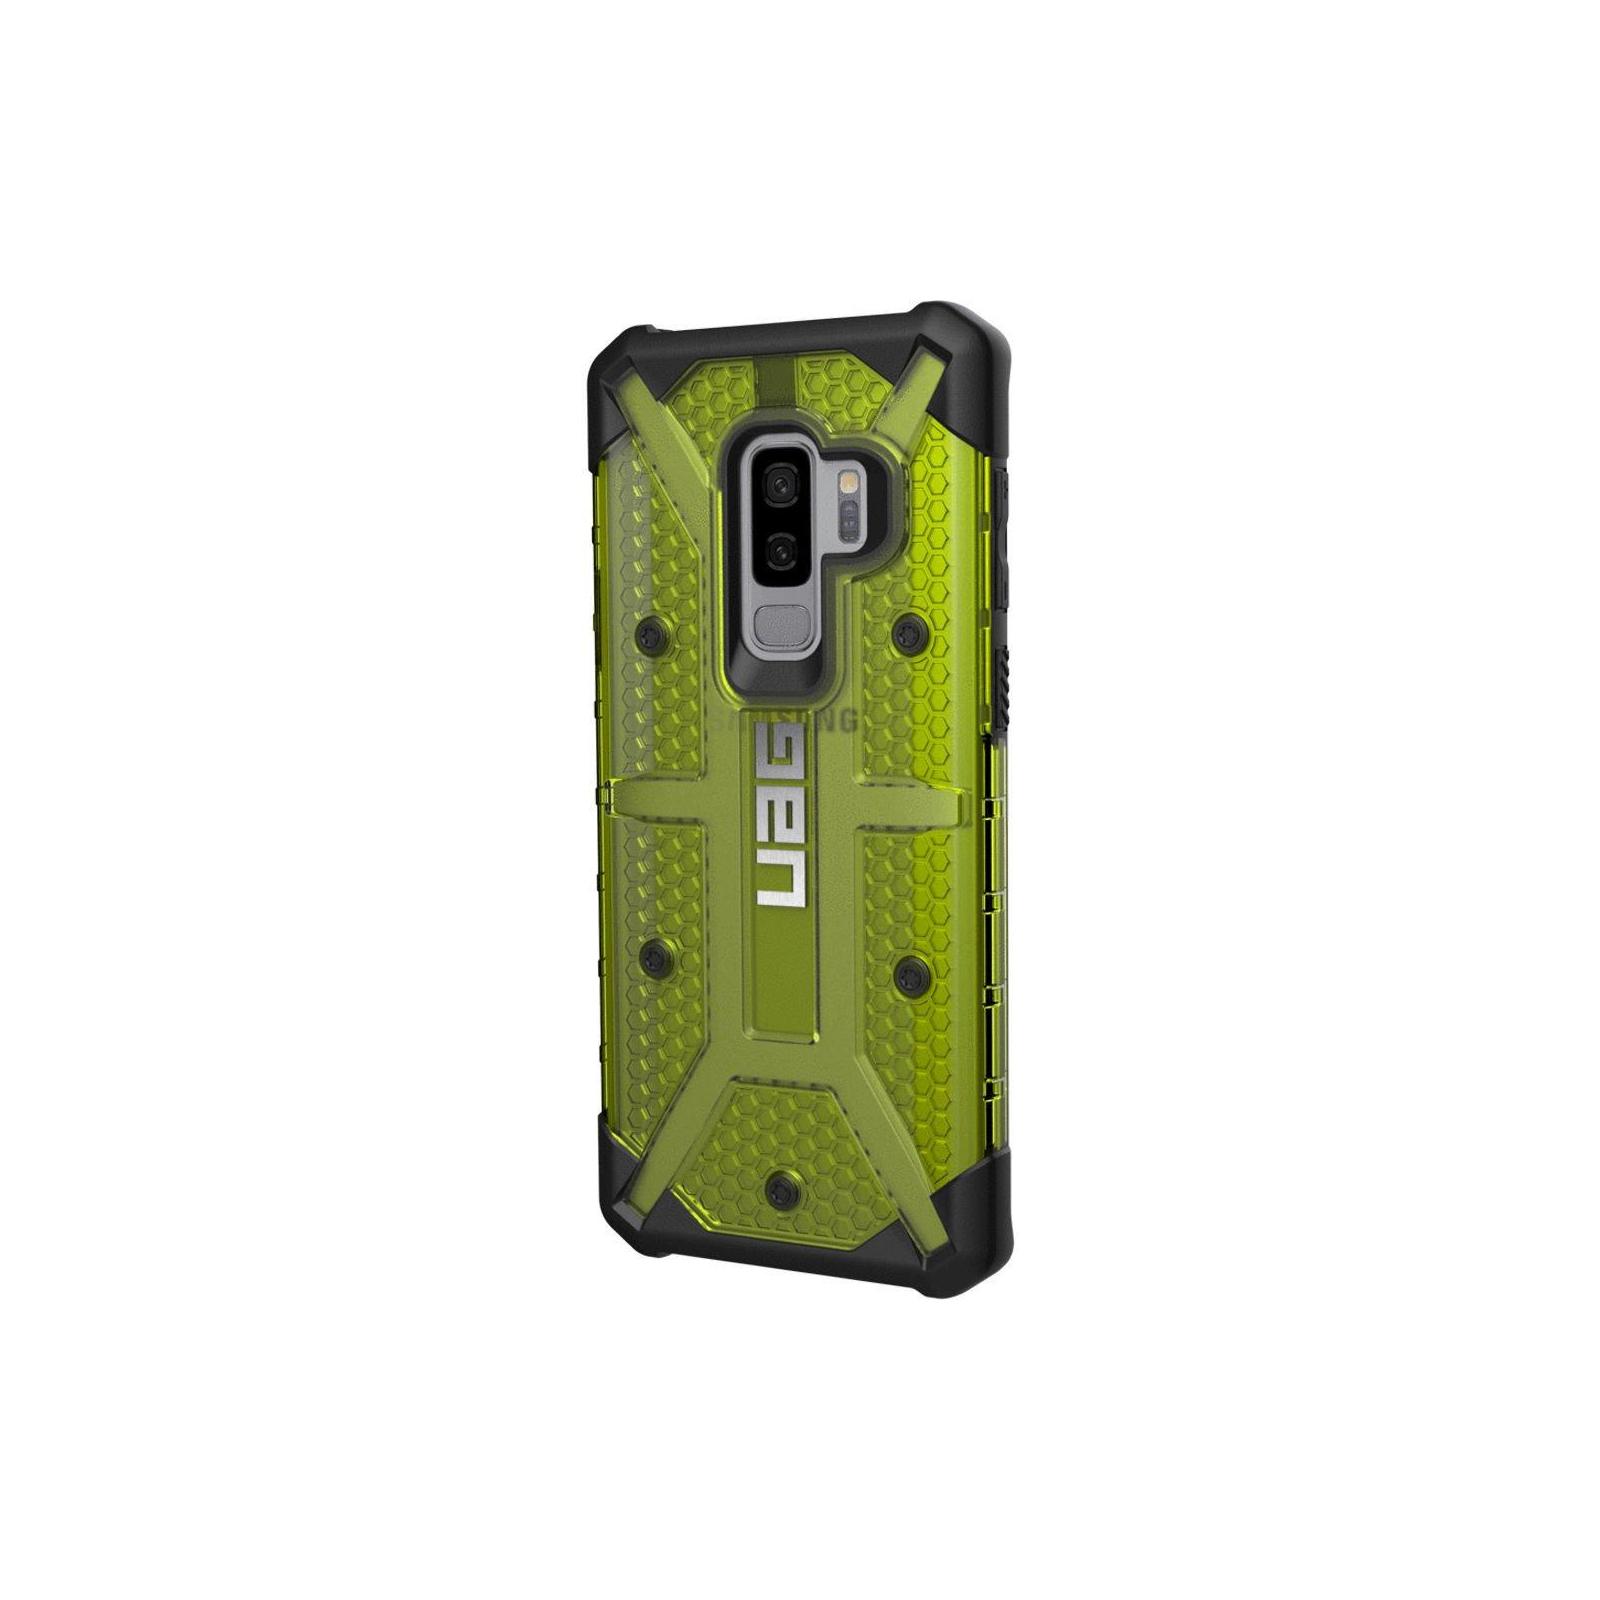 Чехол для моб. телефона Urban Armor Gear Galaxy S9+ Plasma Citron (GLXS9PLS-L-CT) изображение 4